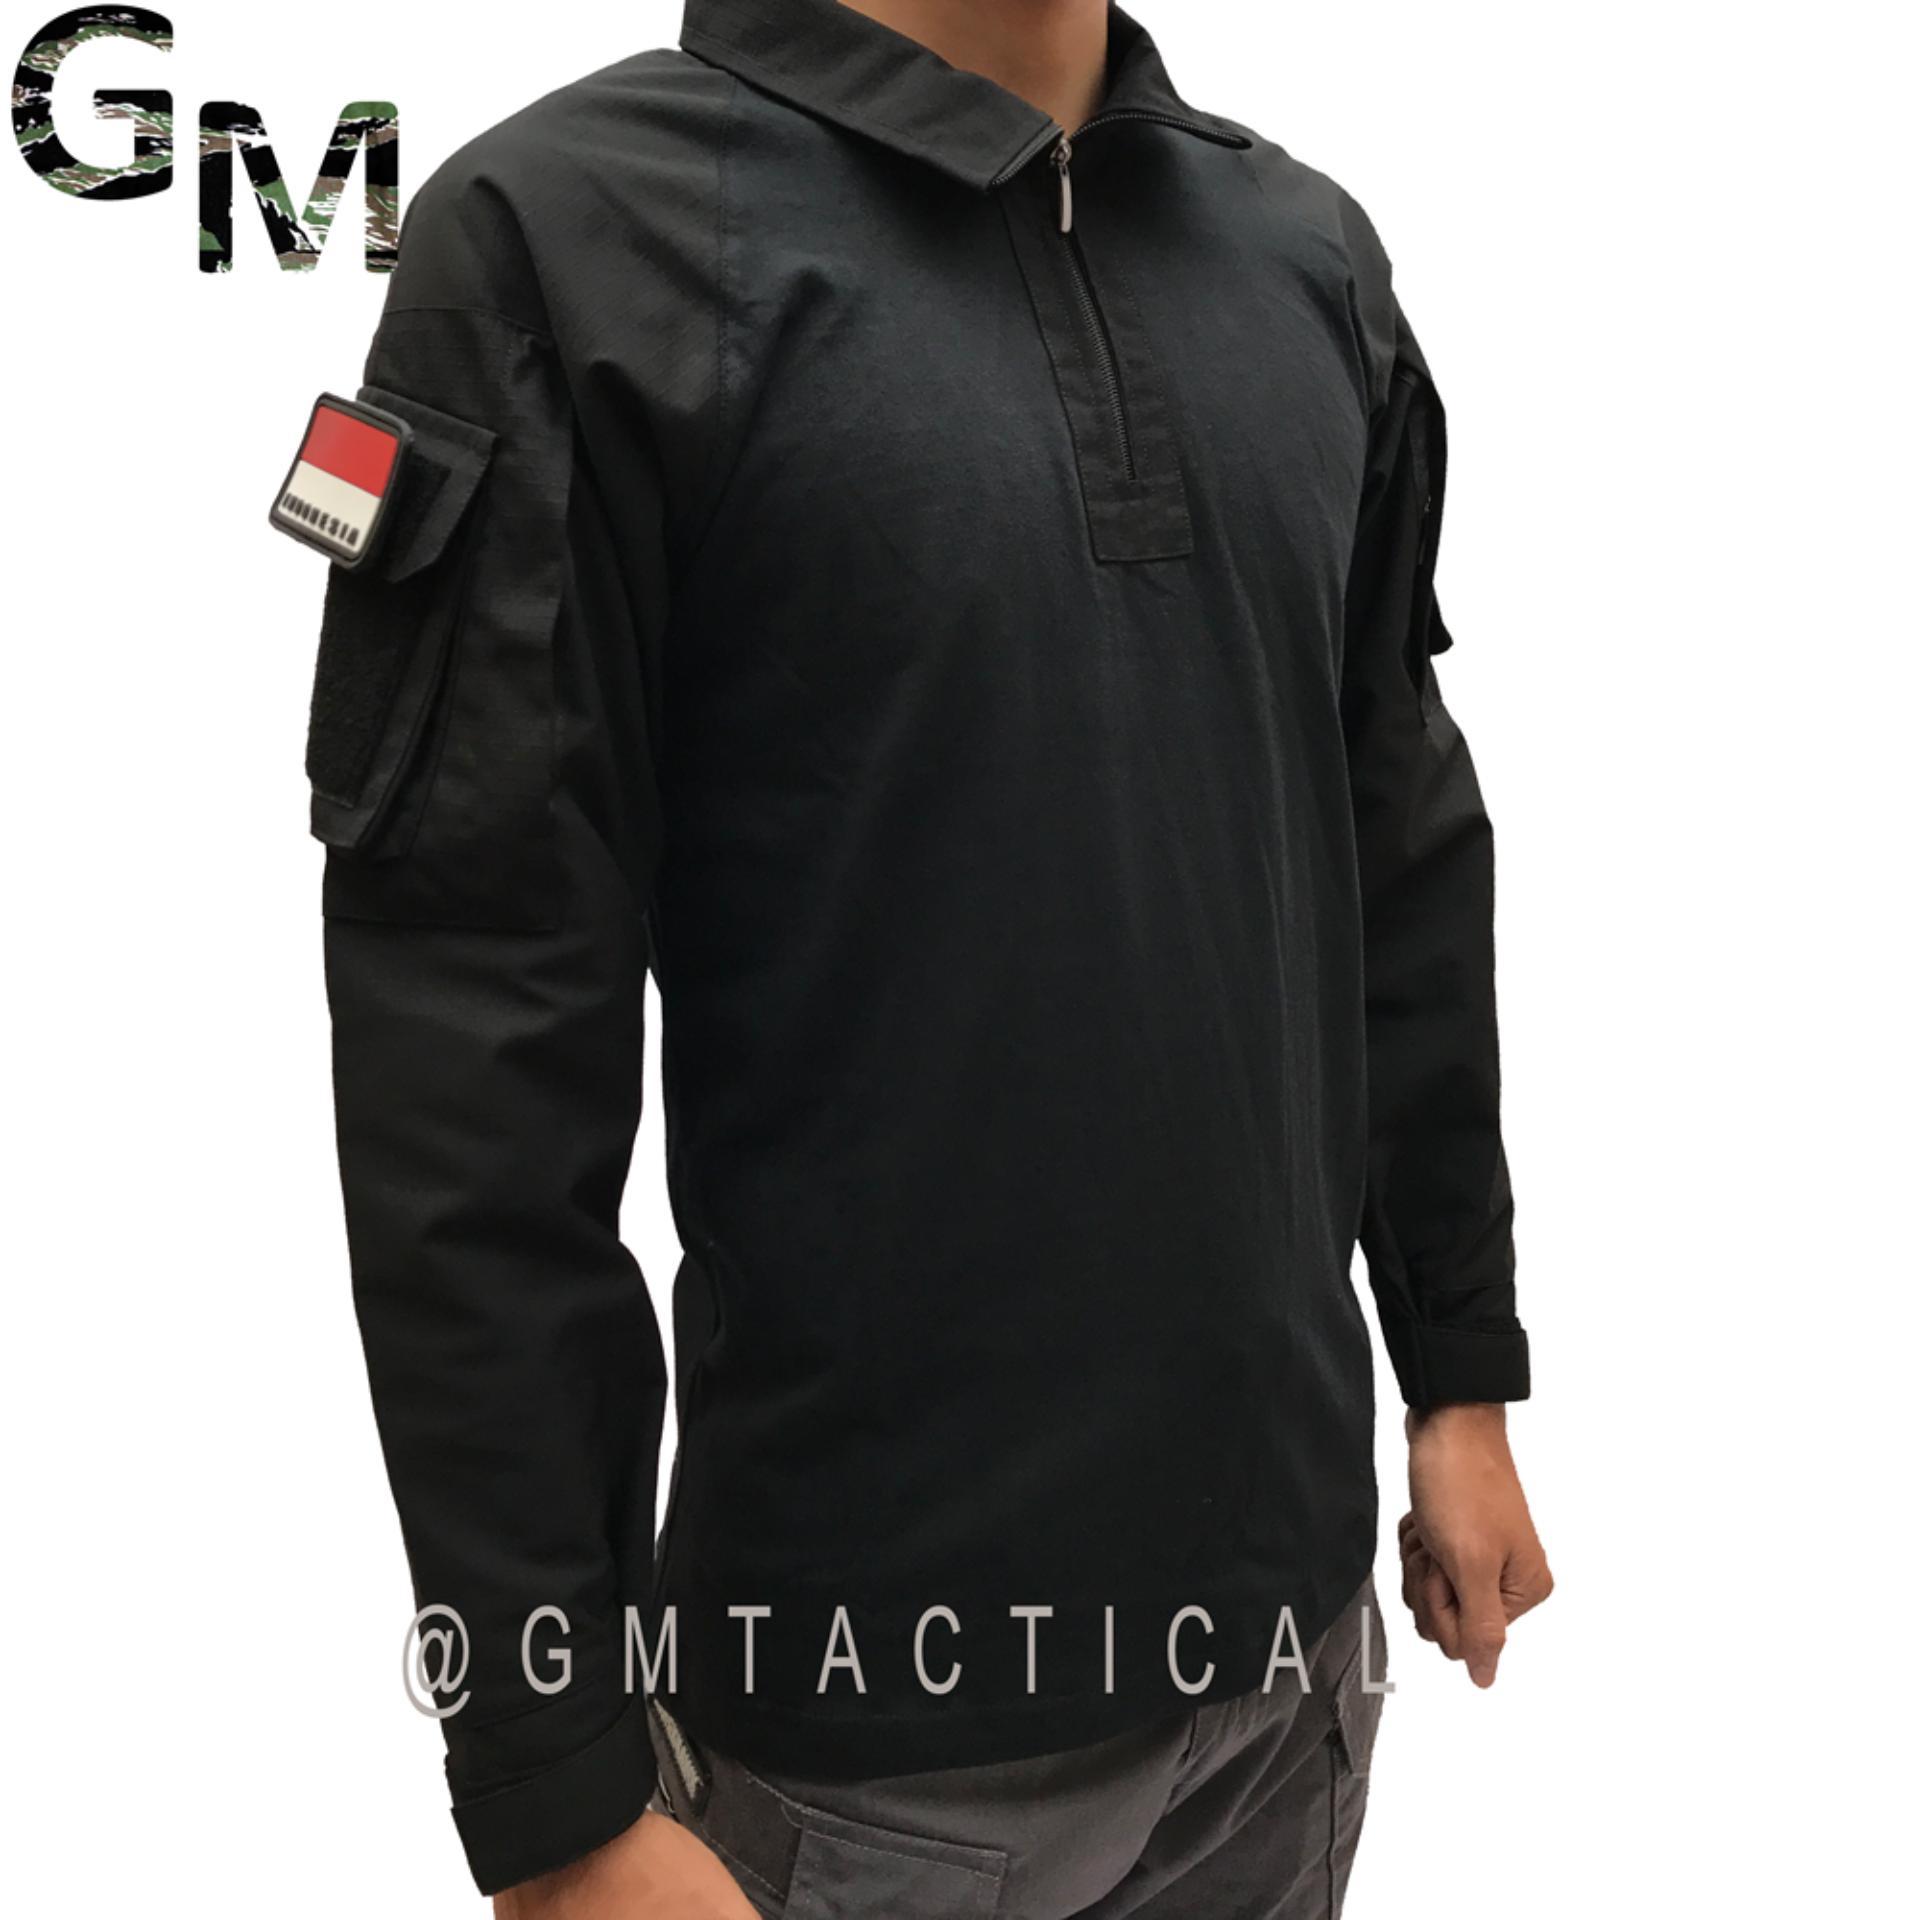 Spesifikasi Combat Shirt Kaos Bdu Kaos Tactical Merk Tactical Blackhawk